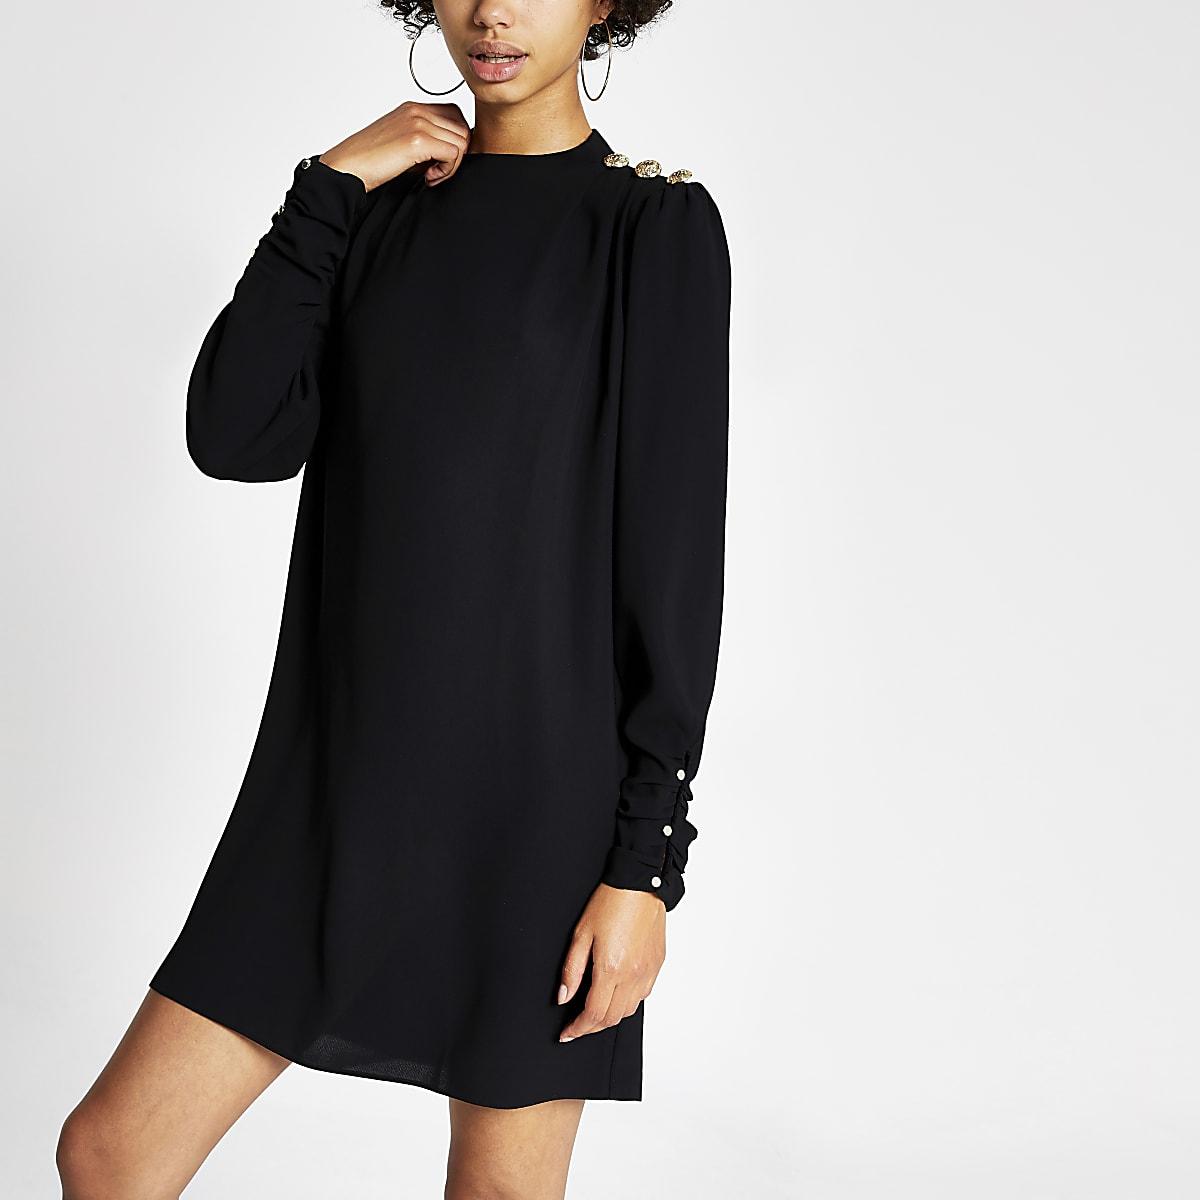 Black button shoulder satin swing dress